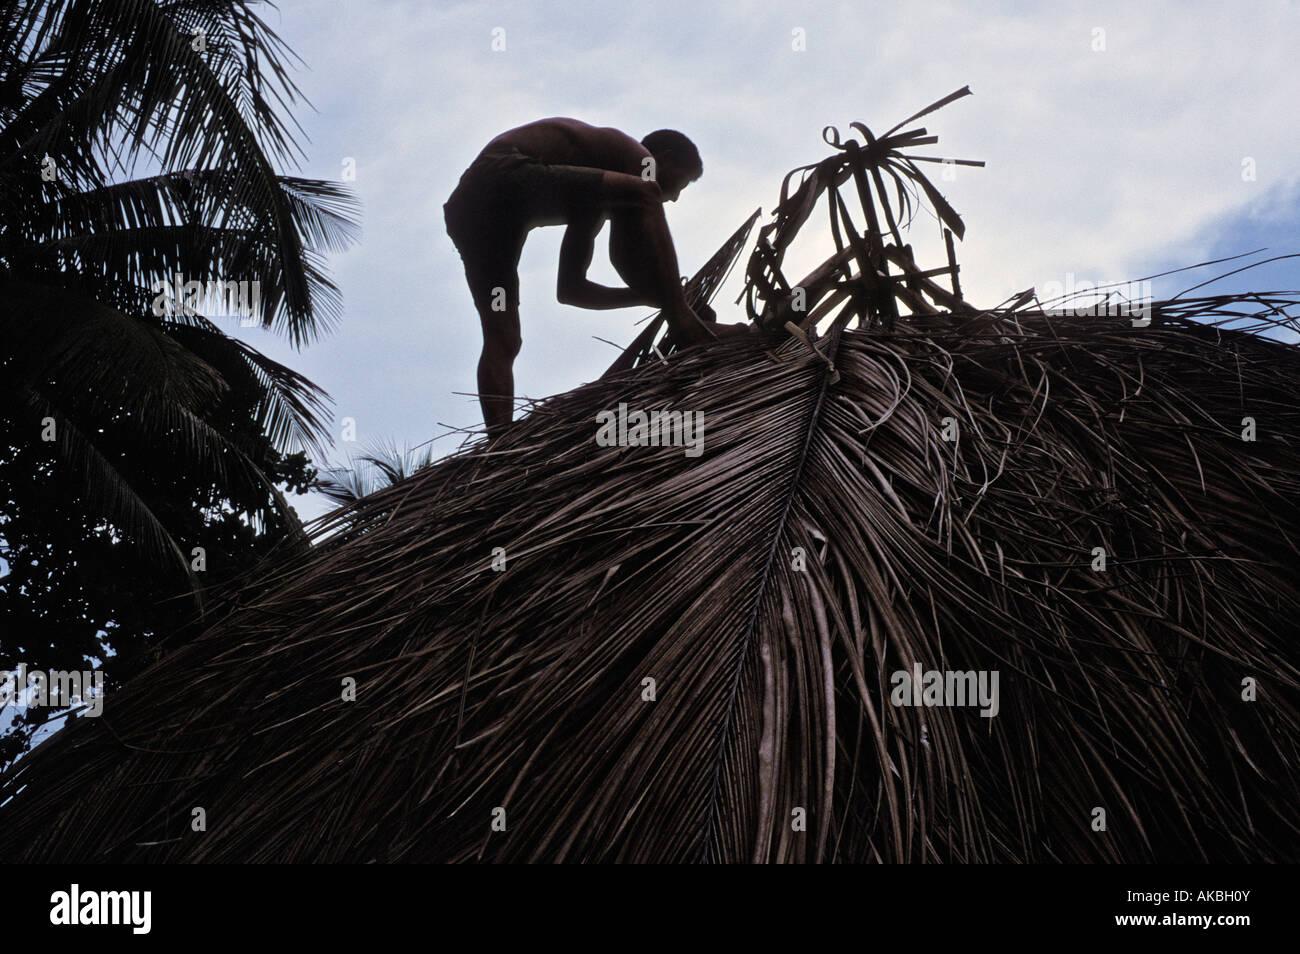 Man thatching roof on a bohio in Barigua near Baracoa Cuba - Stock Image